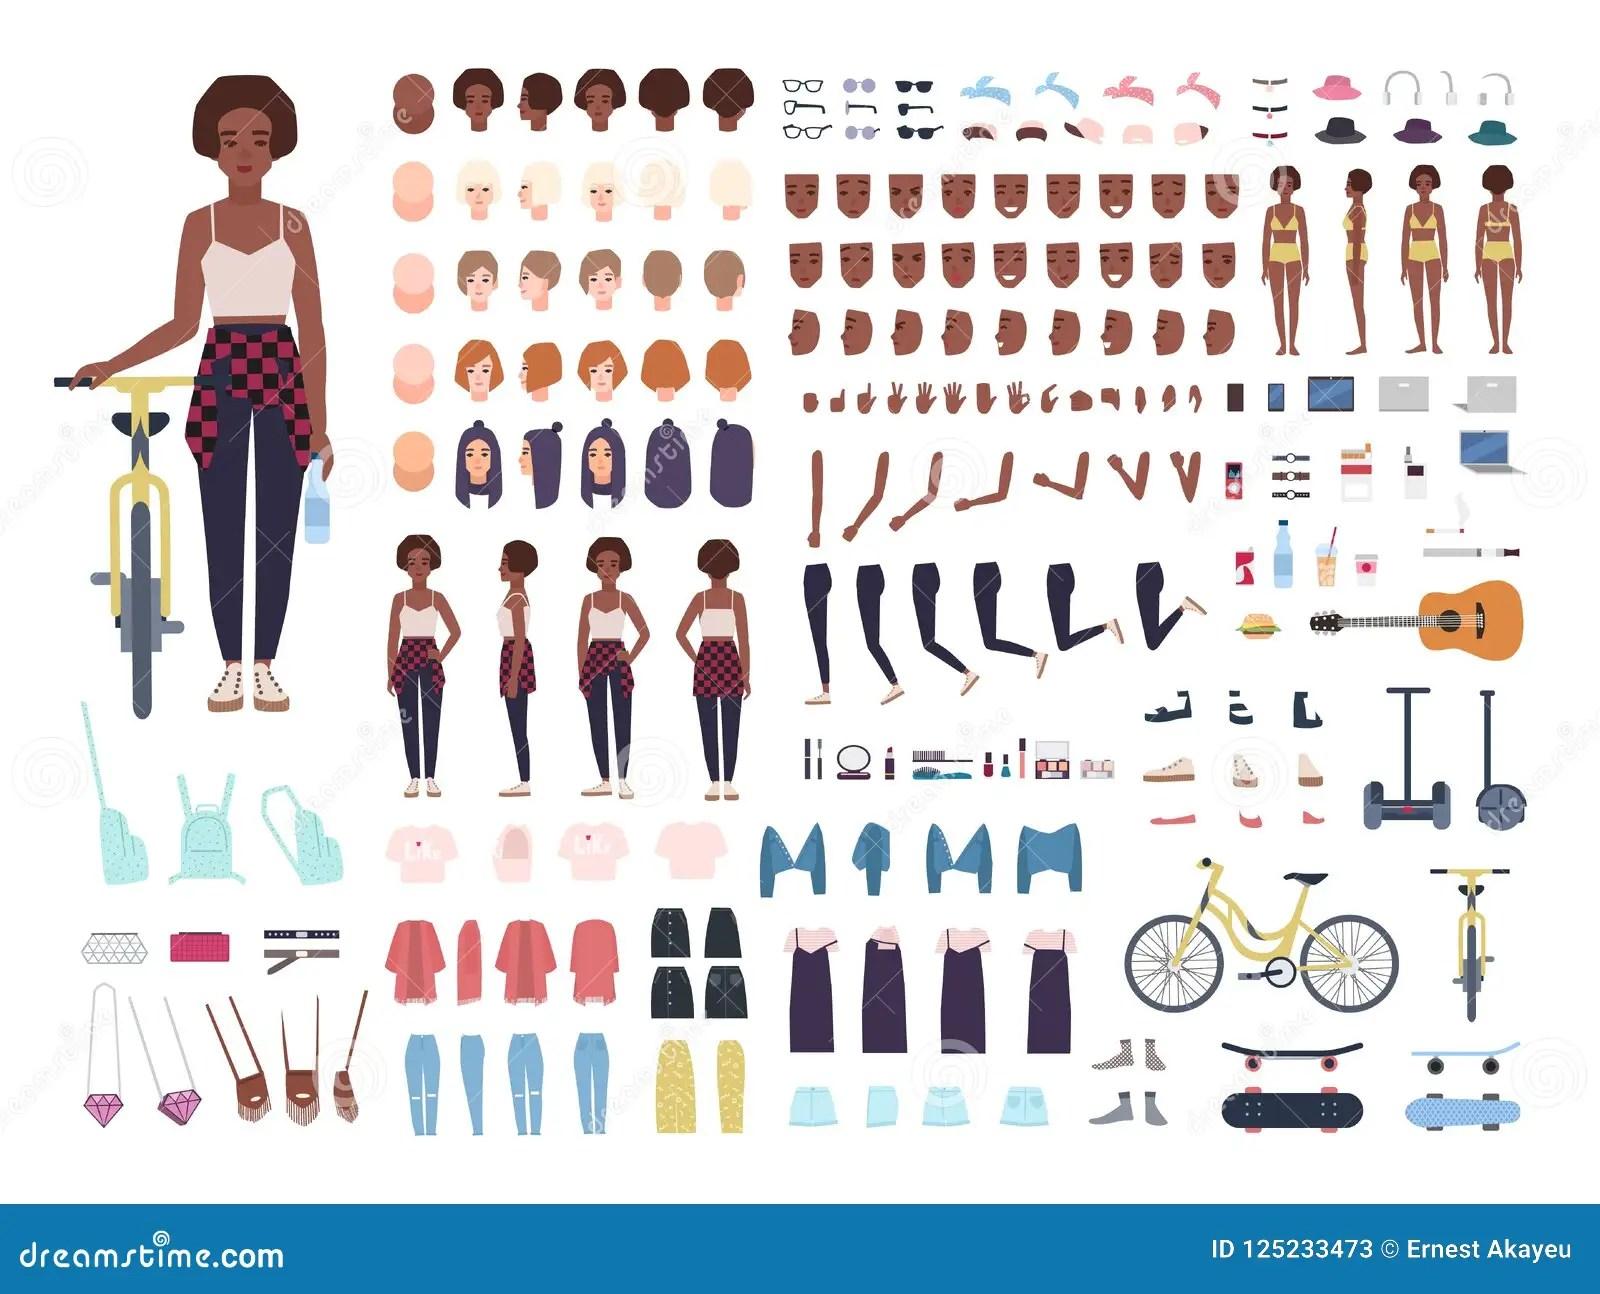 African American Teenage Girl Animation Kit Or Avatar